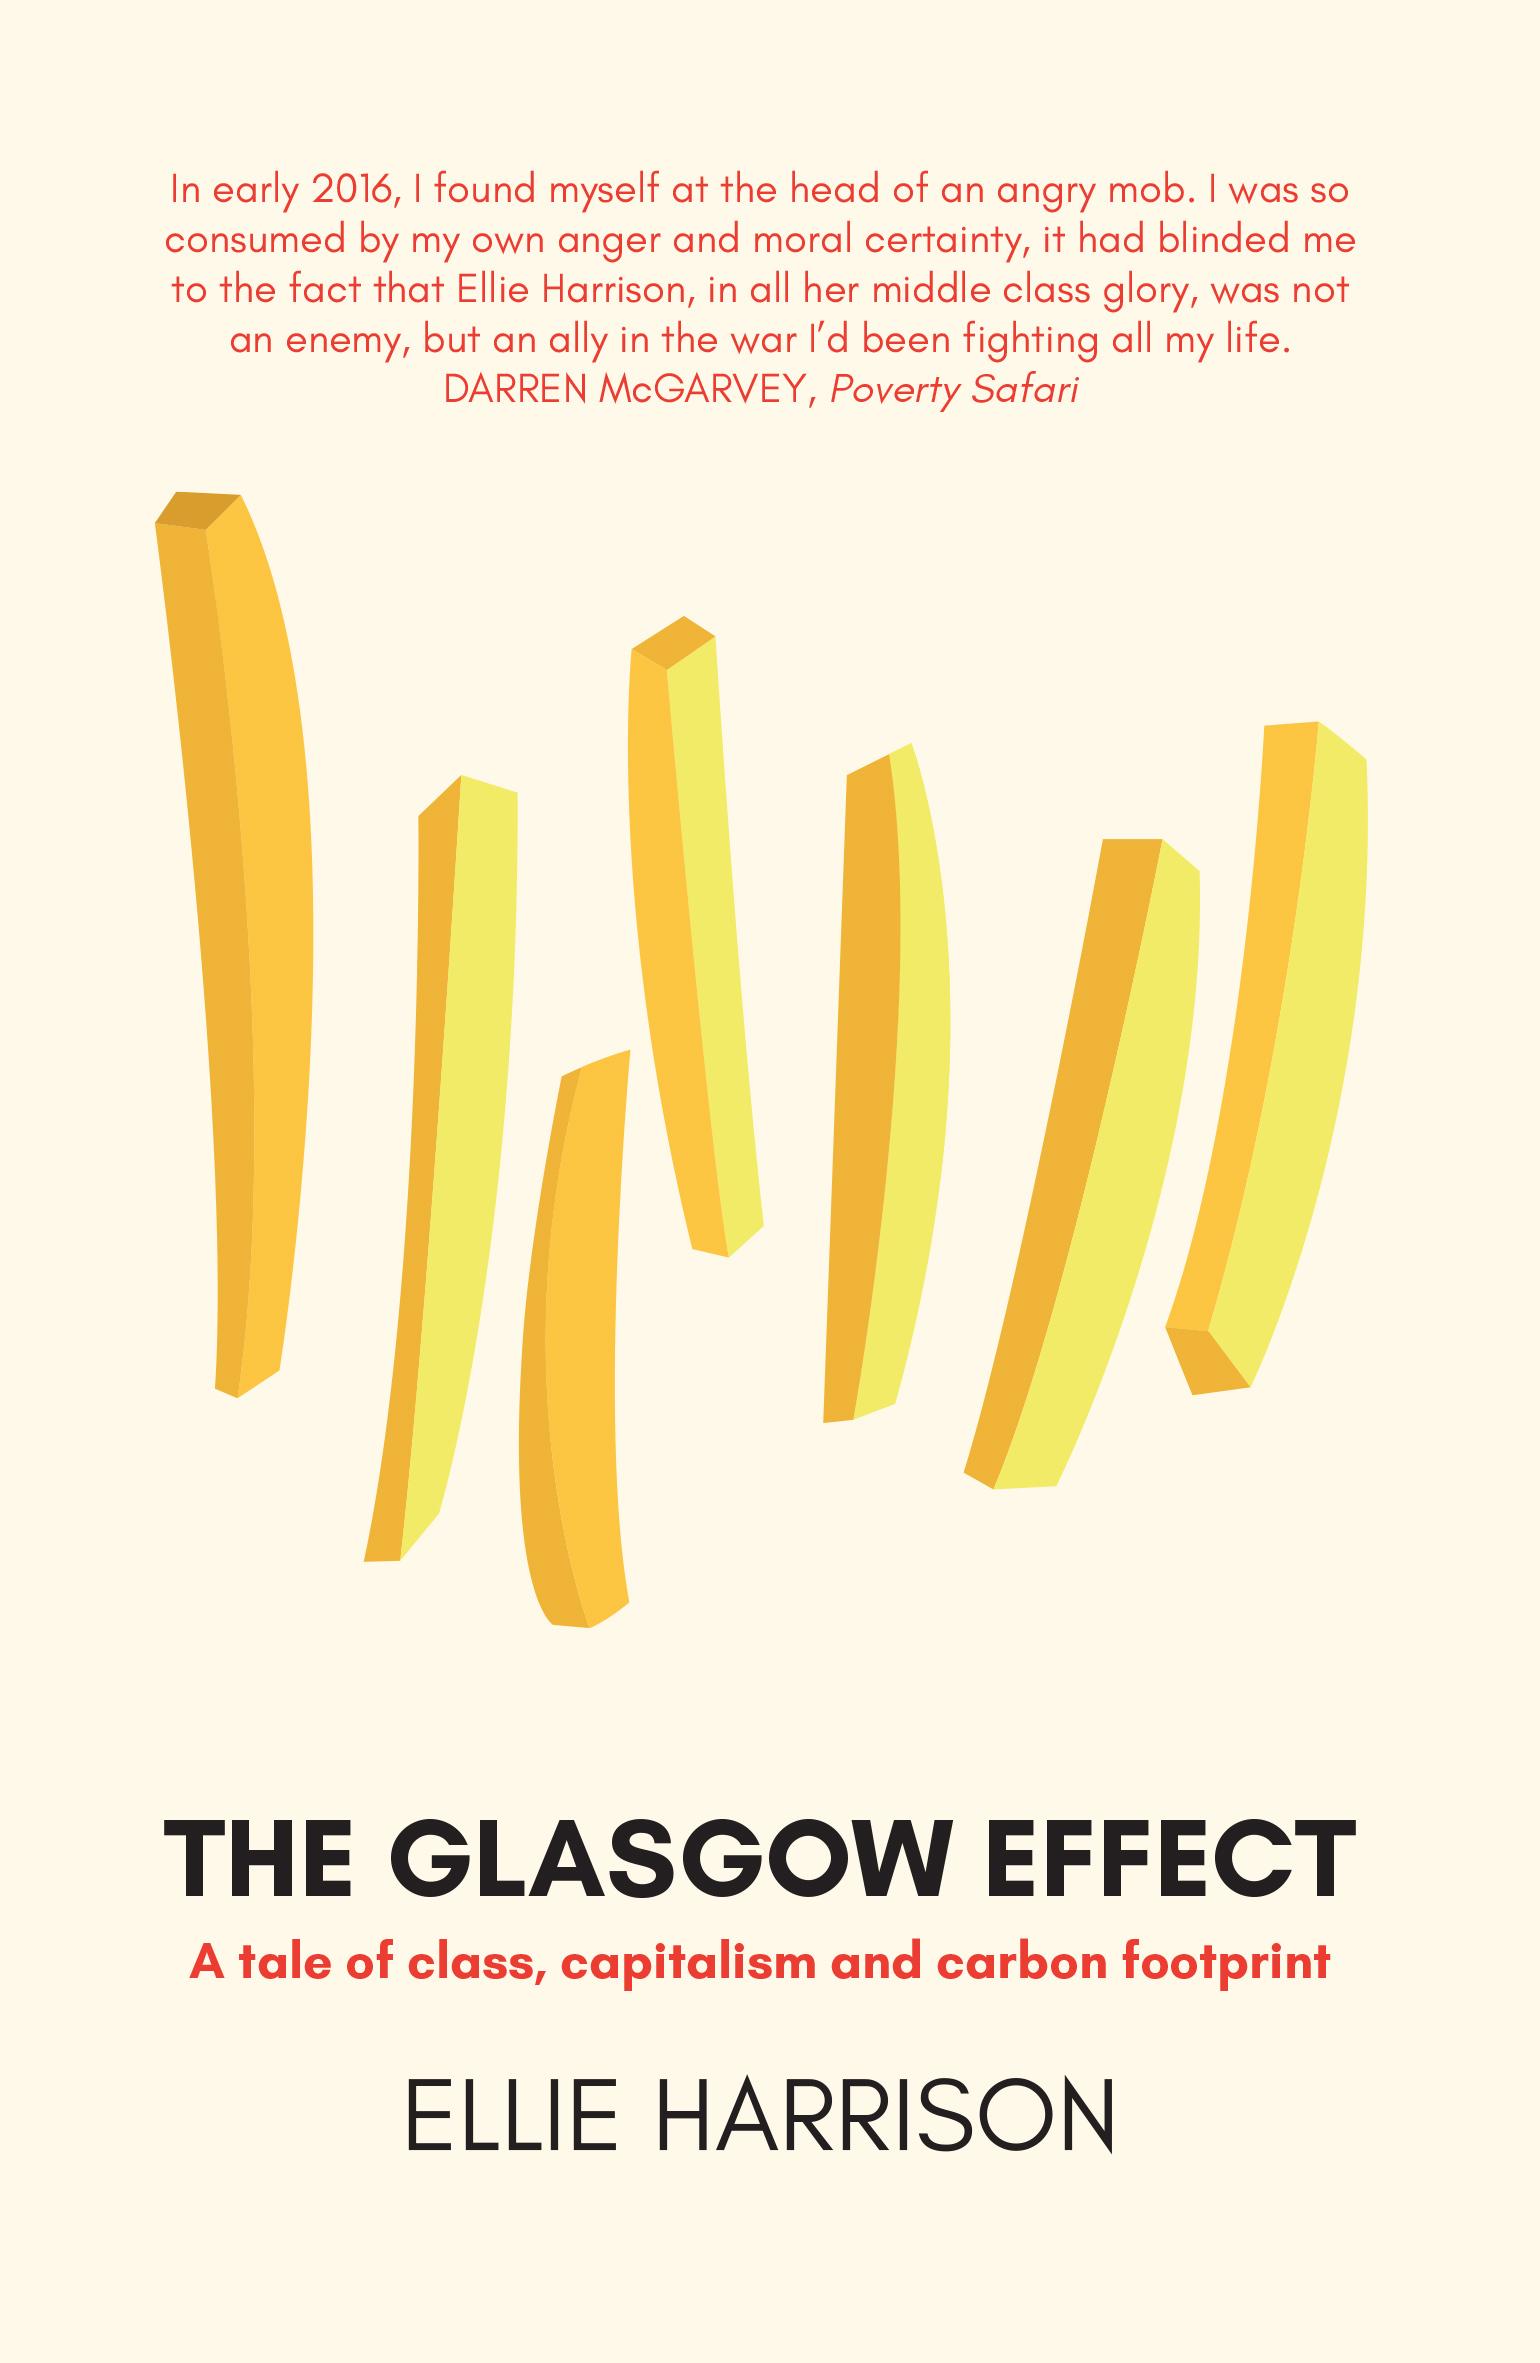 The Glasgow Effect Ellie Harrison 9781912147960 Luath Press.jpg